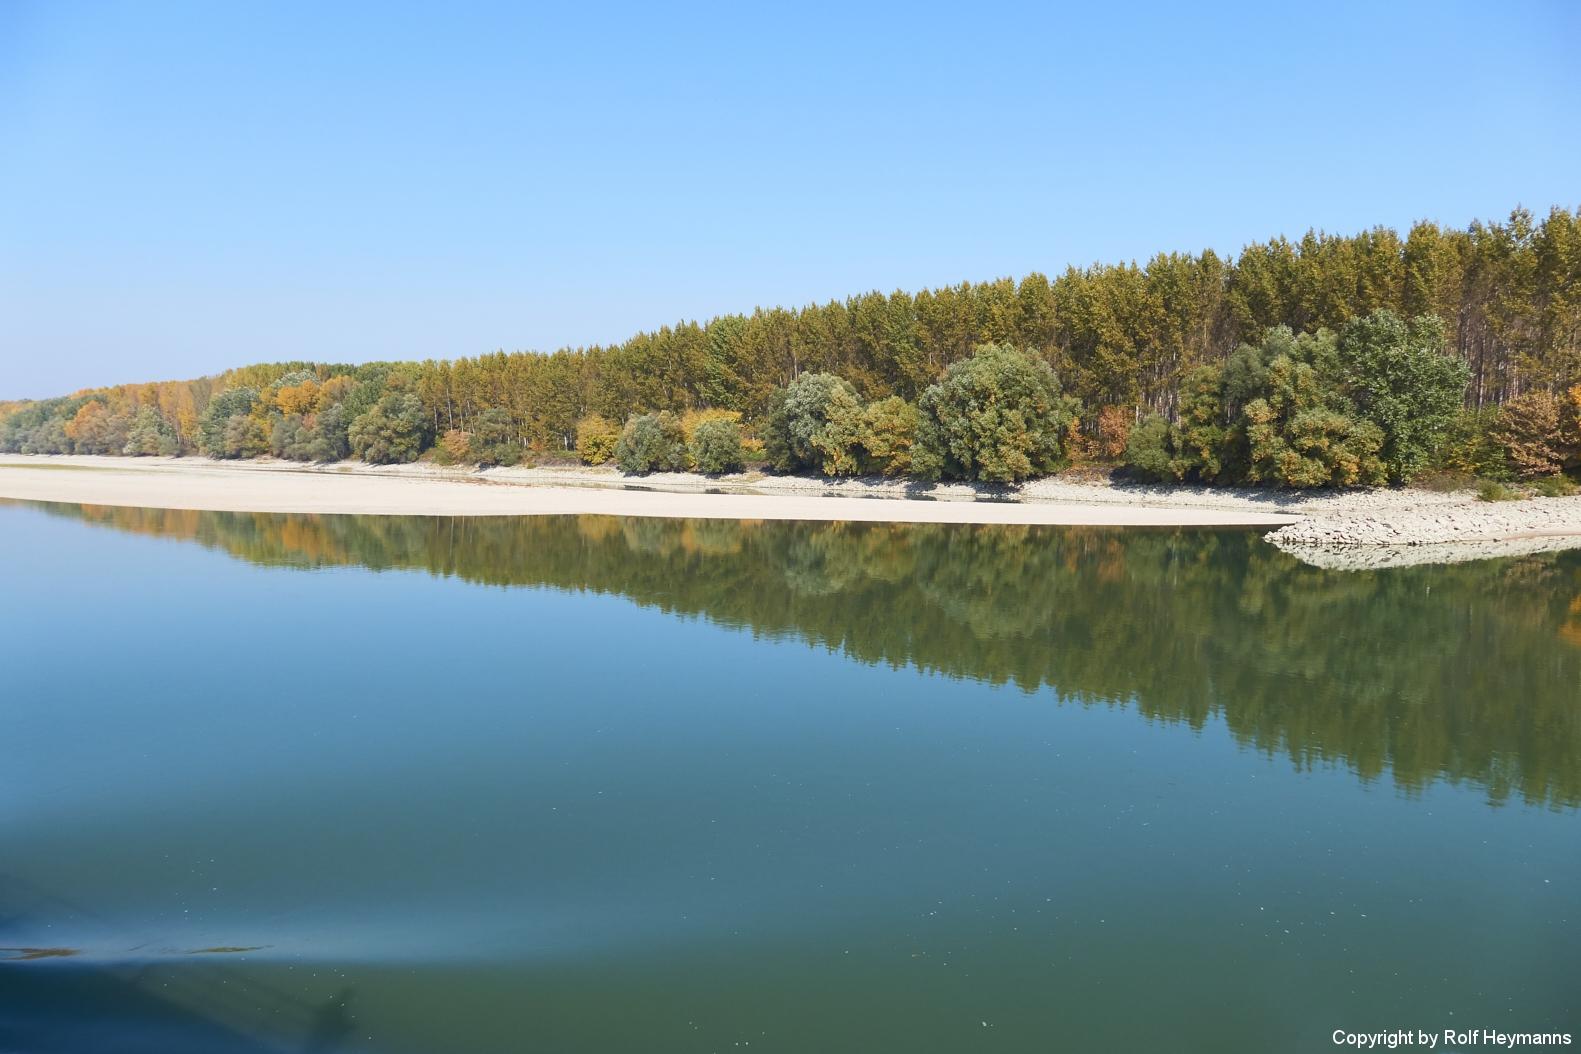 Donaulandschaft #2